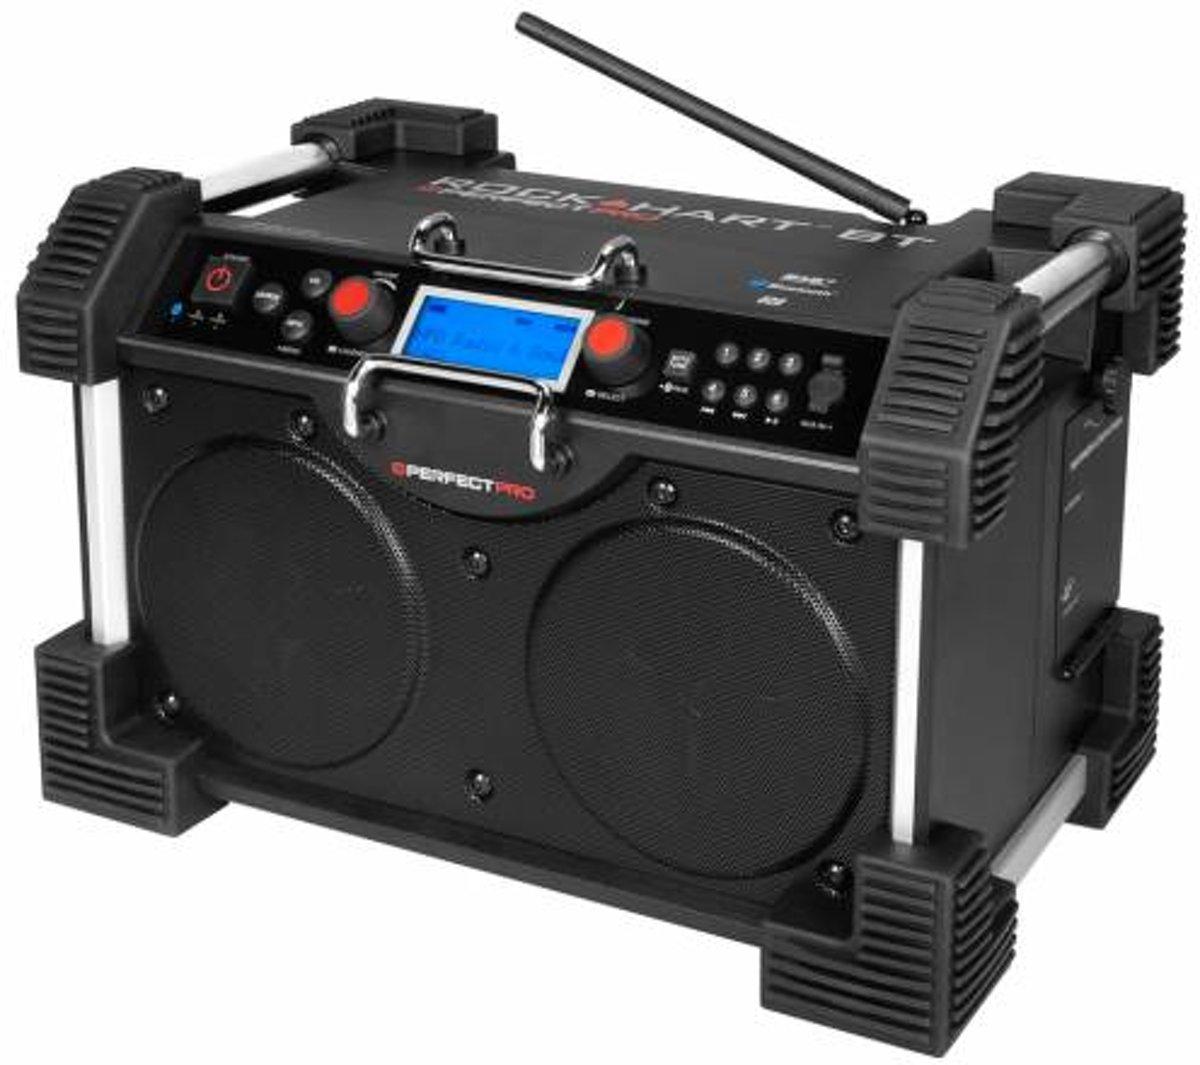 bol | bouwradio kopen? alle bouwradio's online